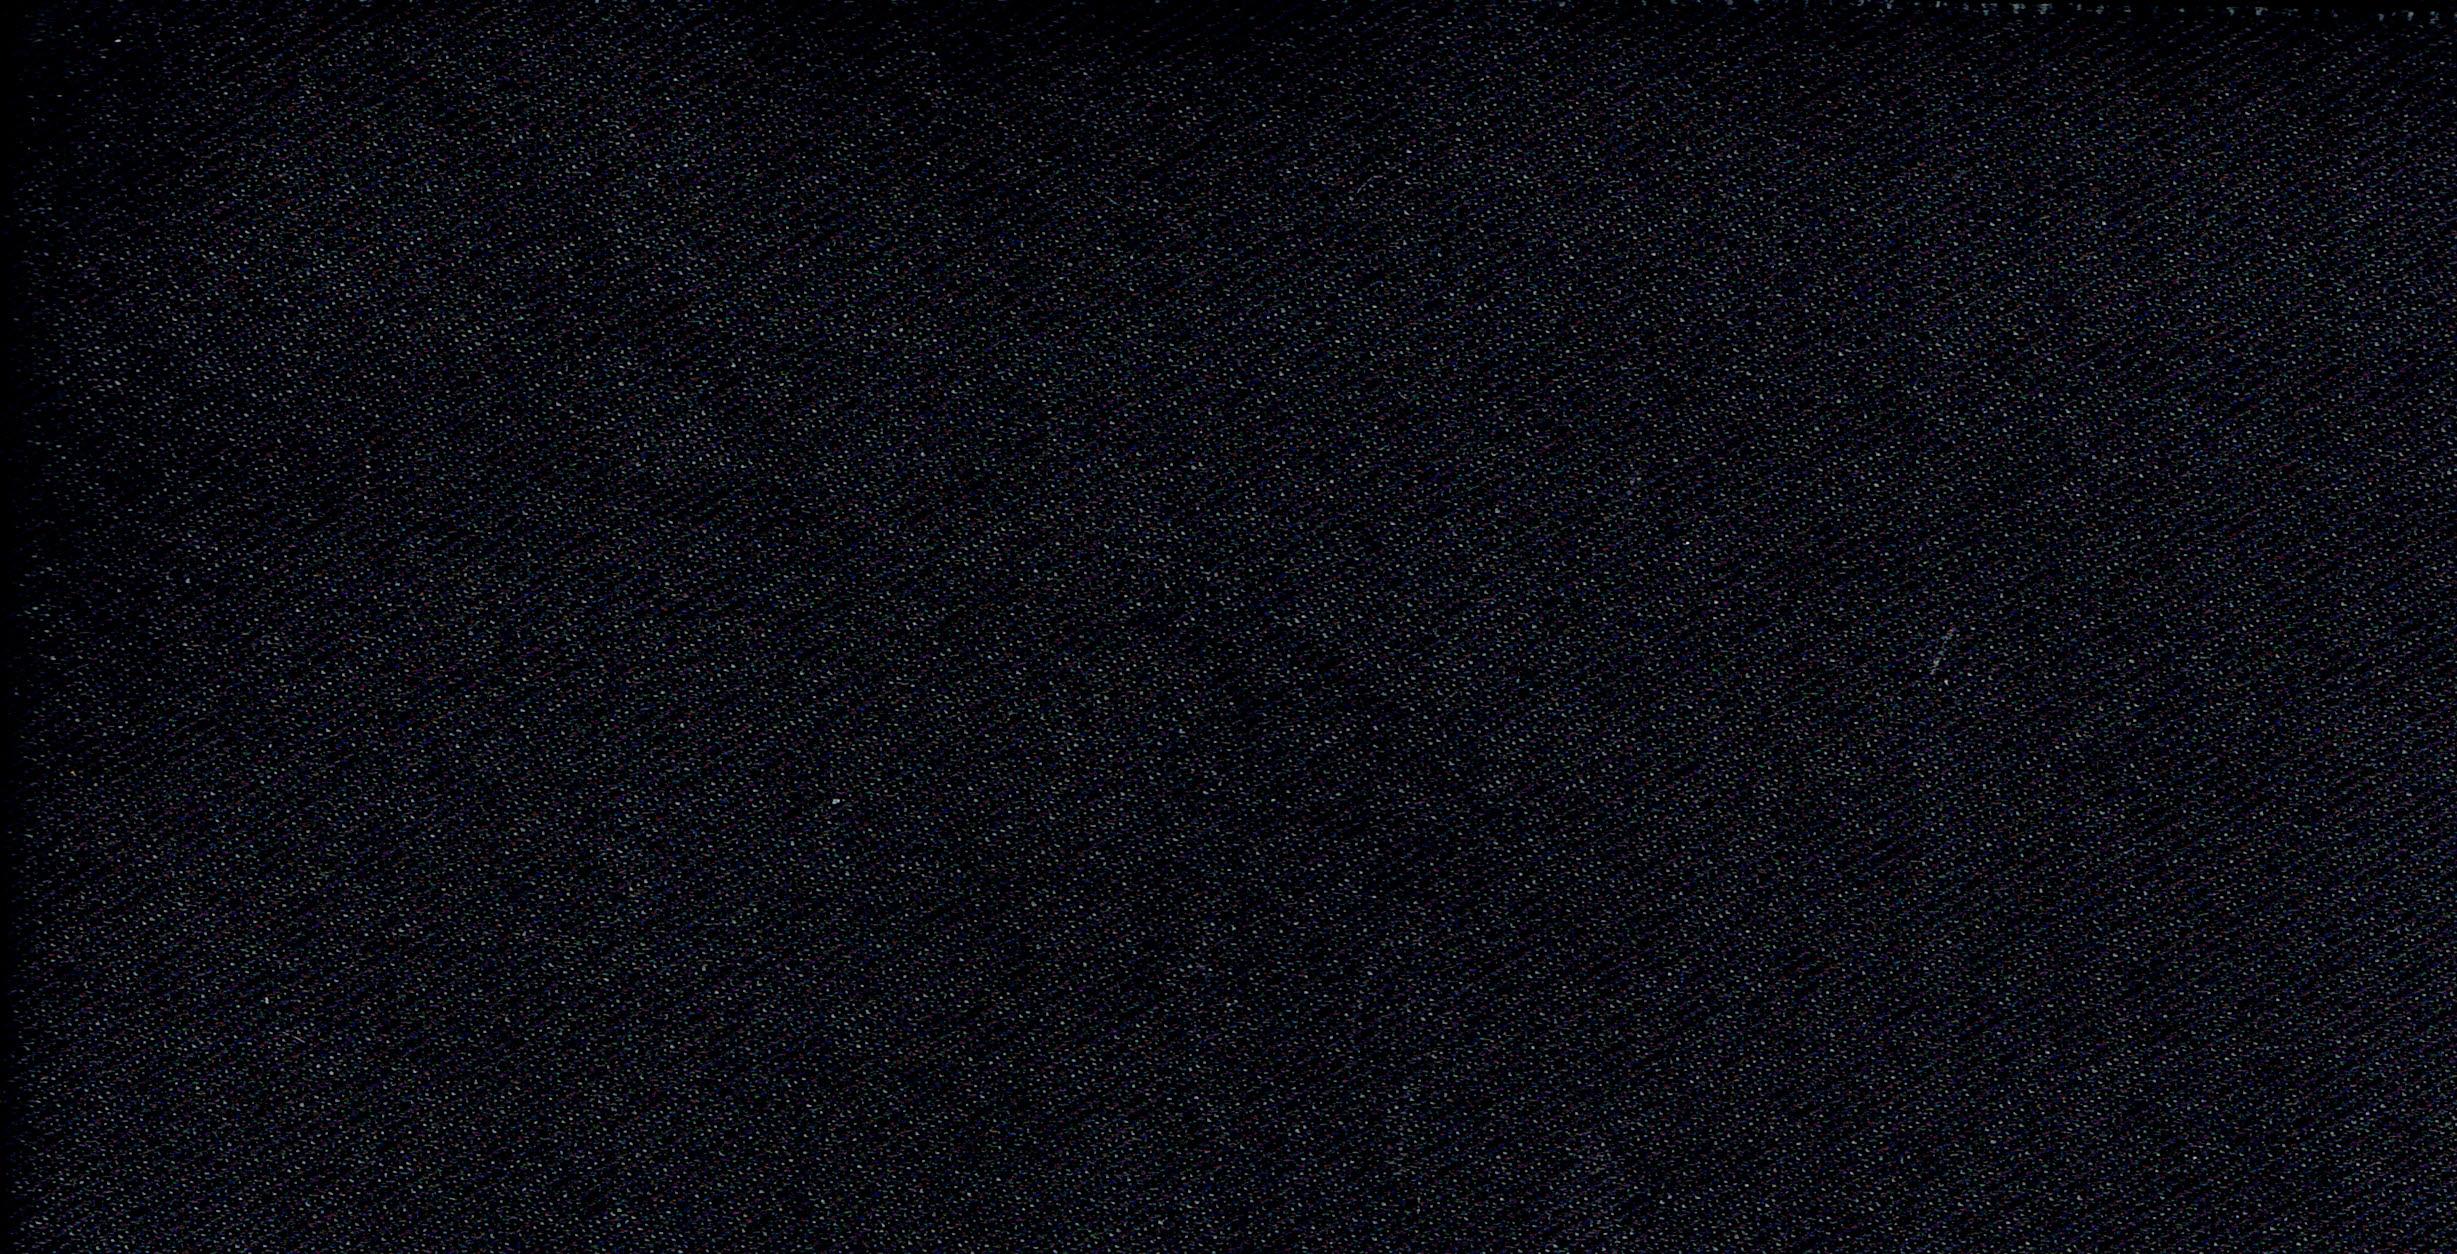 fabric26082015_0018.jpg